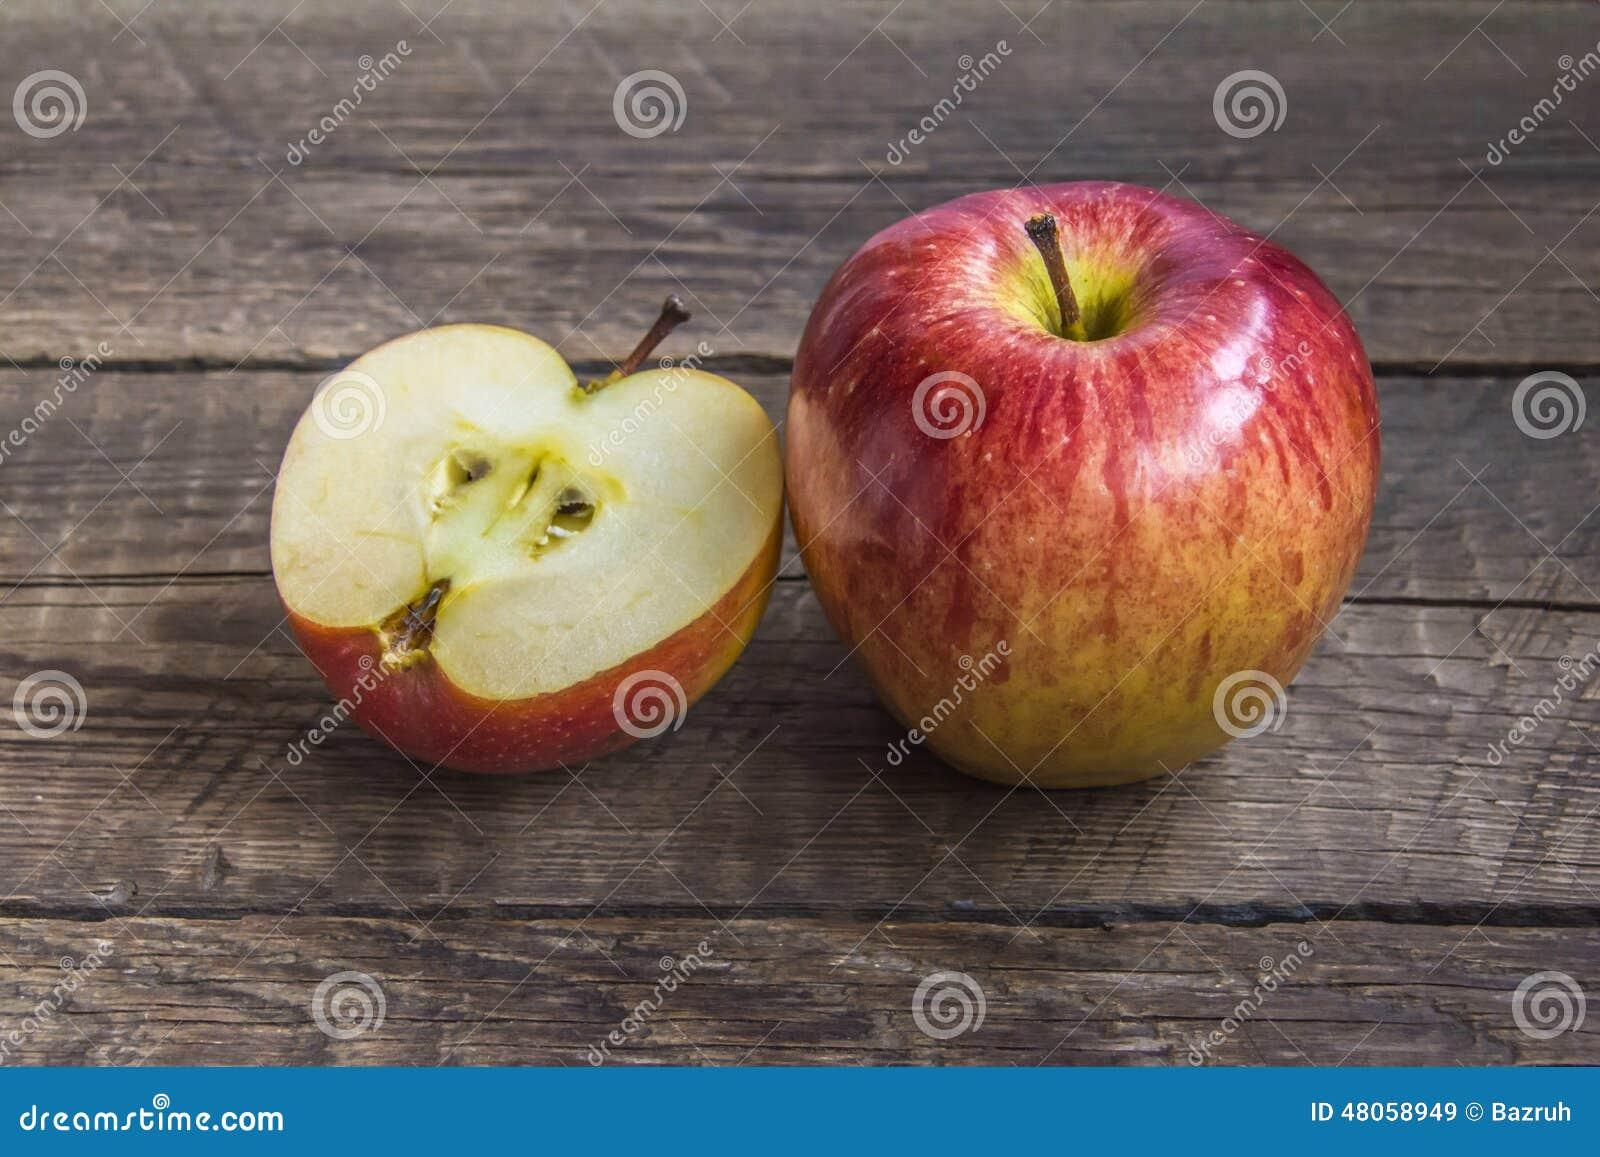 Één grote en één gehakte appel